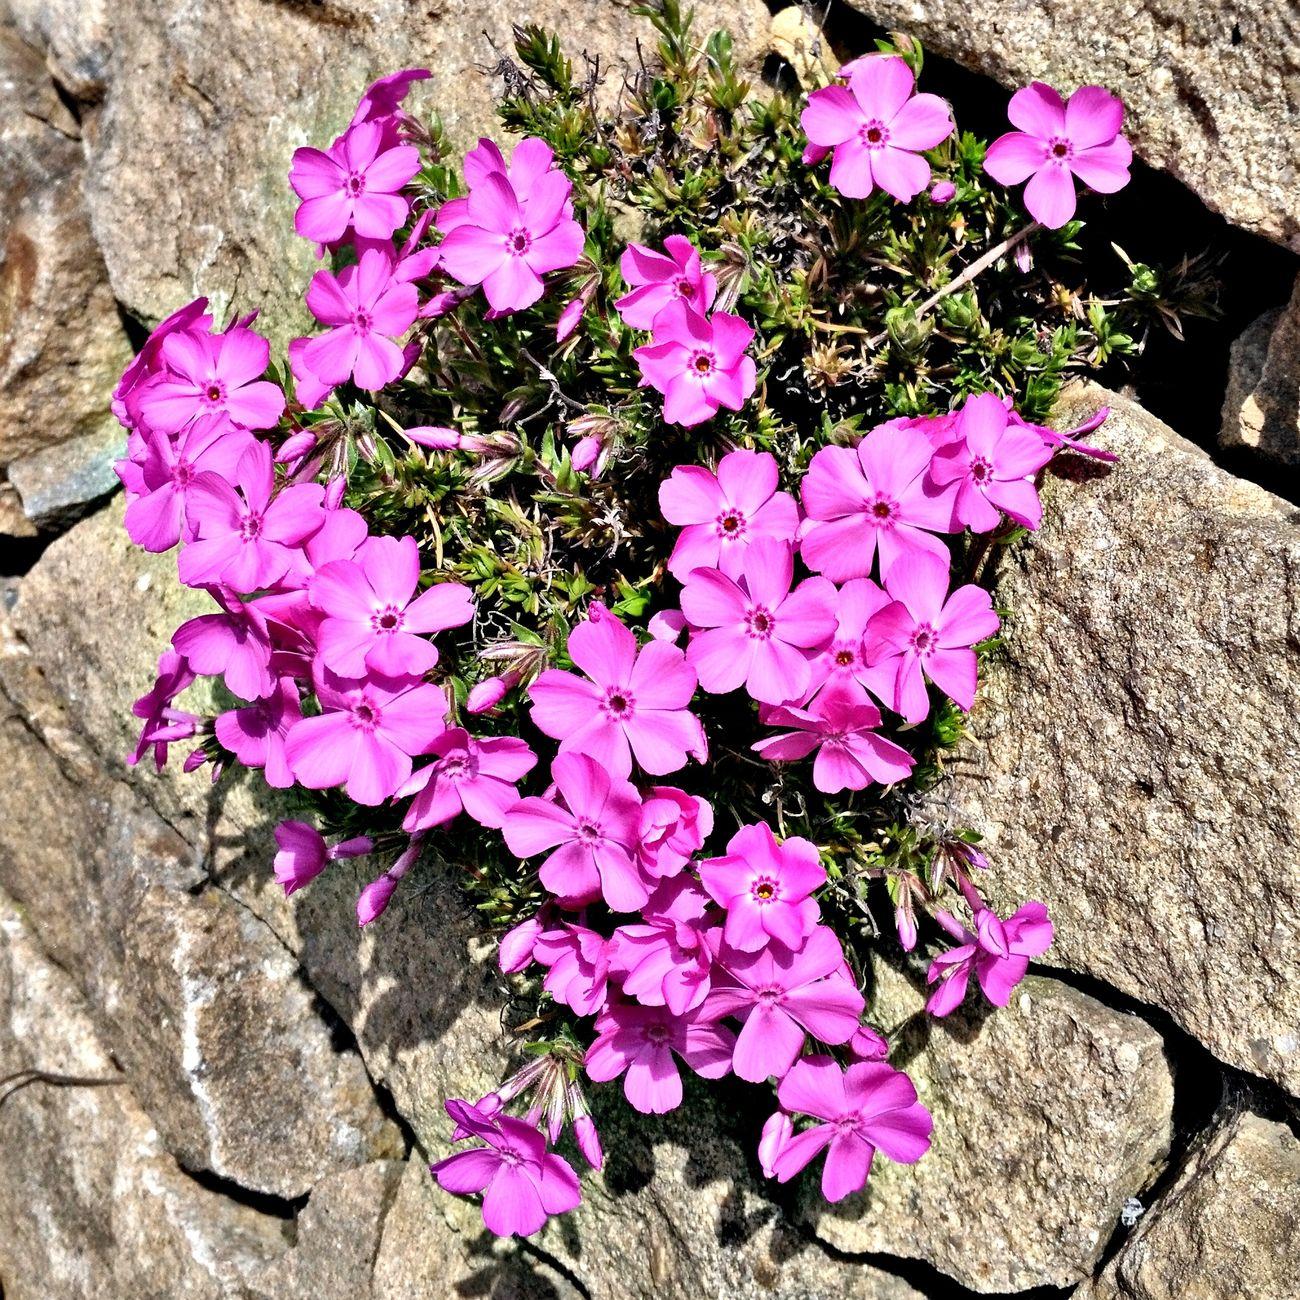 Garden Nature Amazing Flower Plant Amateurphotographer  World Of Color World_nature World Multi Colored